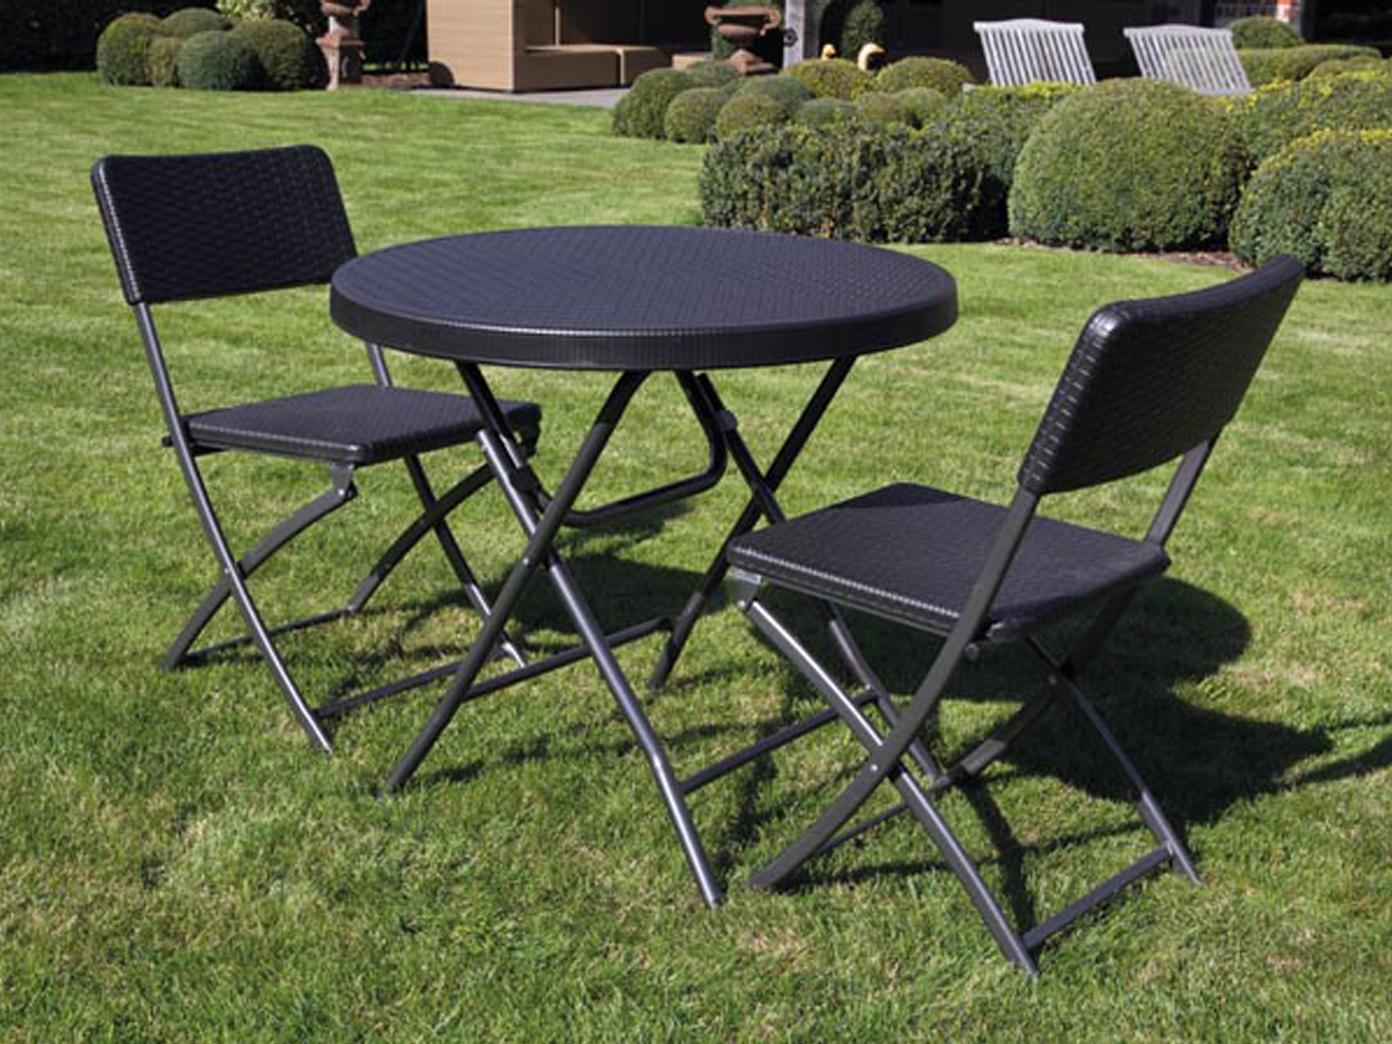 3 teilige schwarze sitzgarnitur wetterfest klappbar. Black Bedroom Furniture Sets. Home Design Ideas